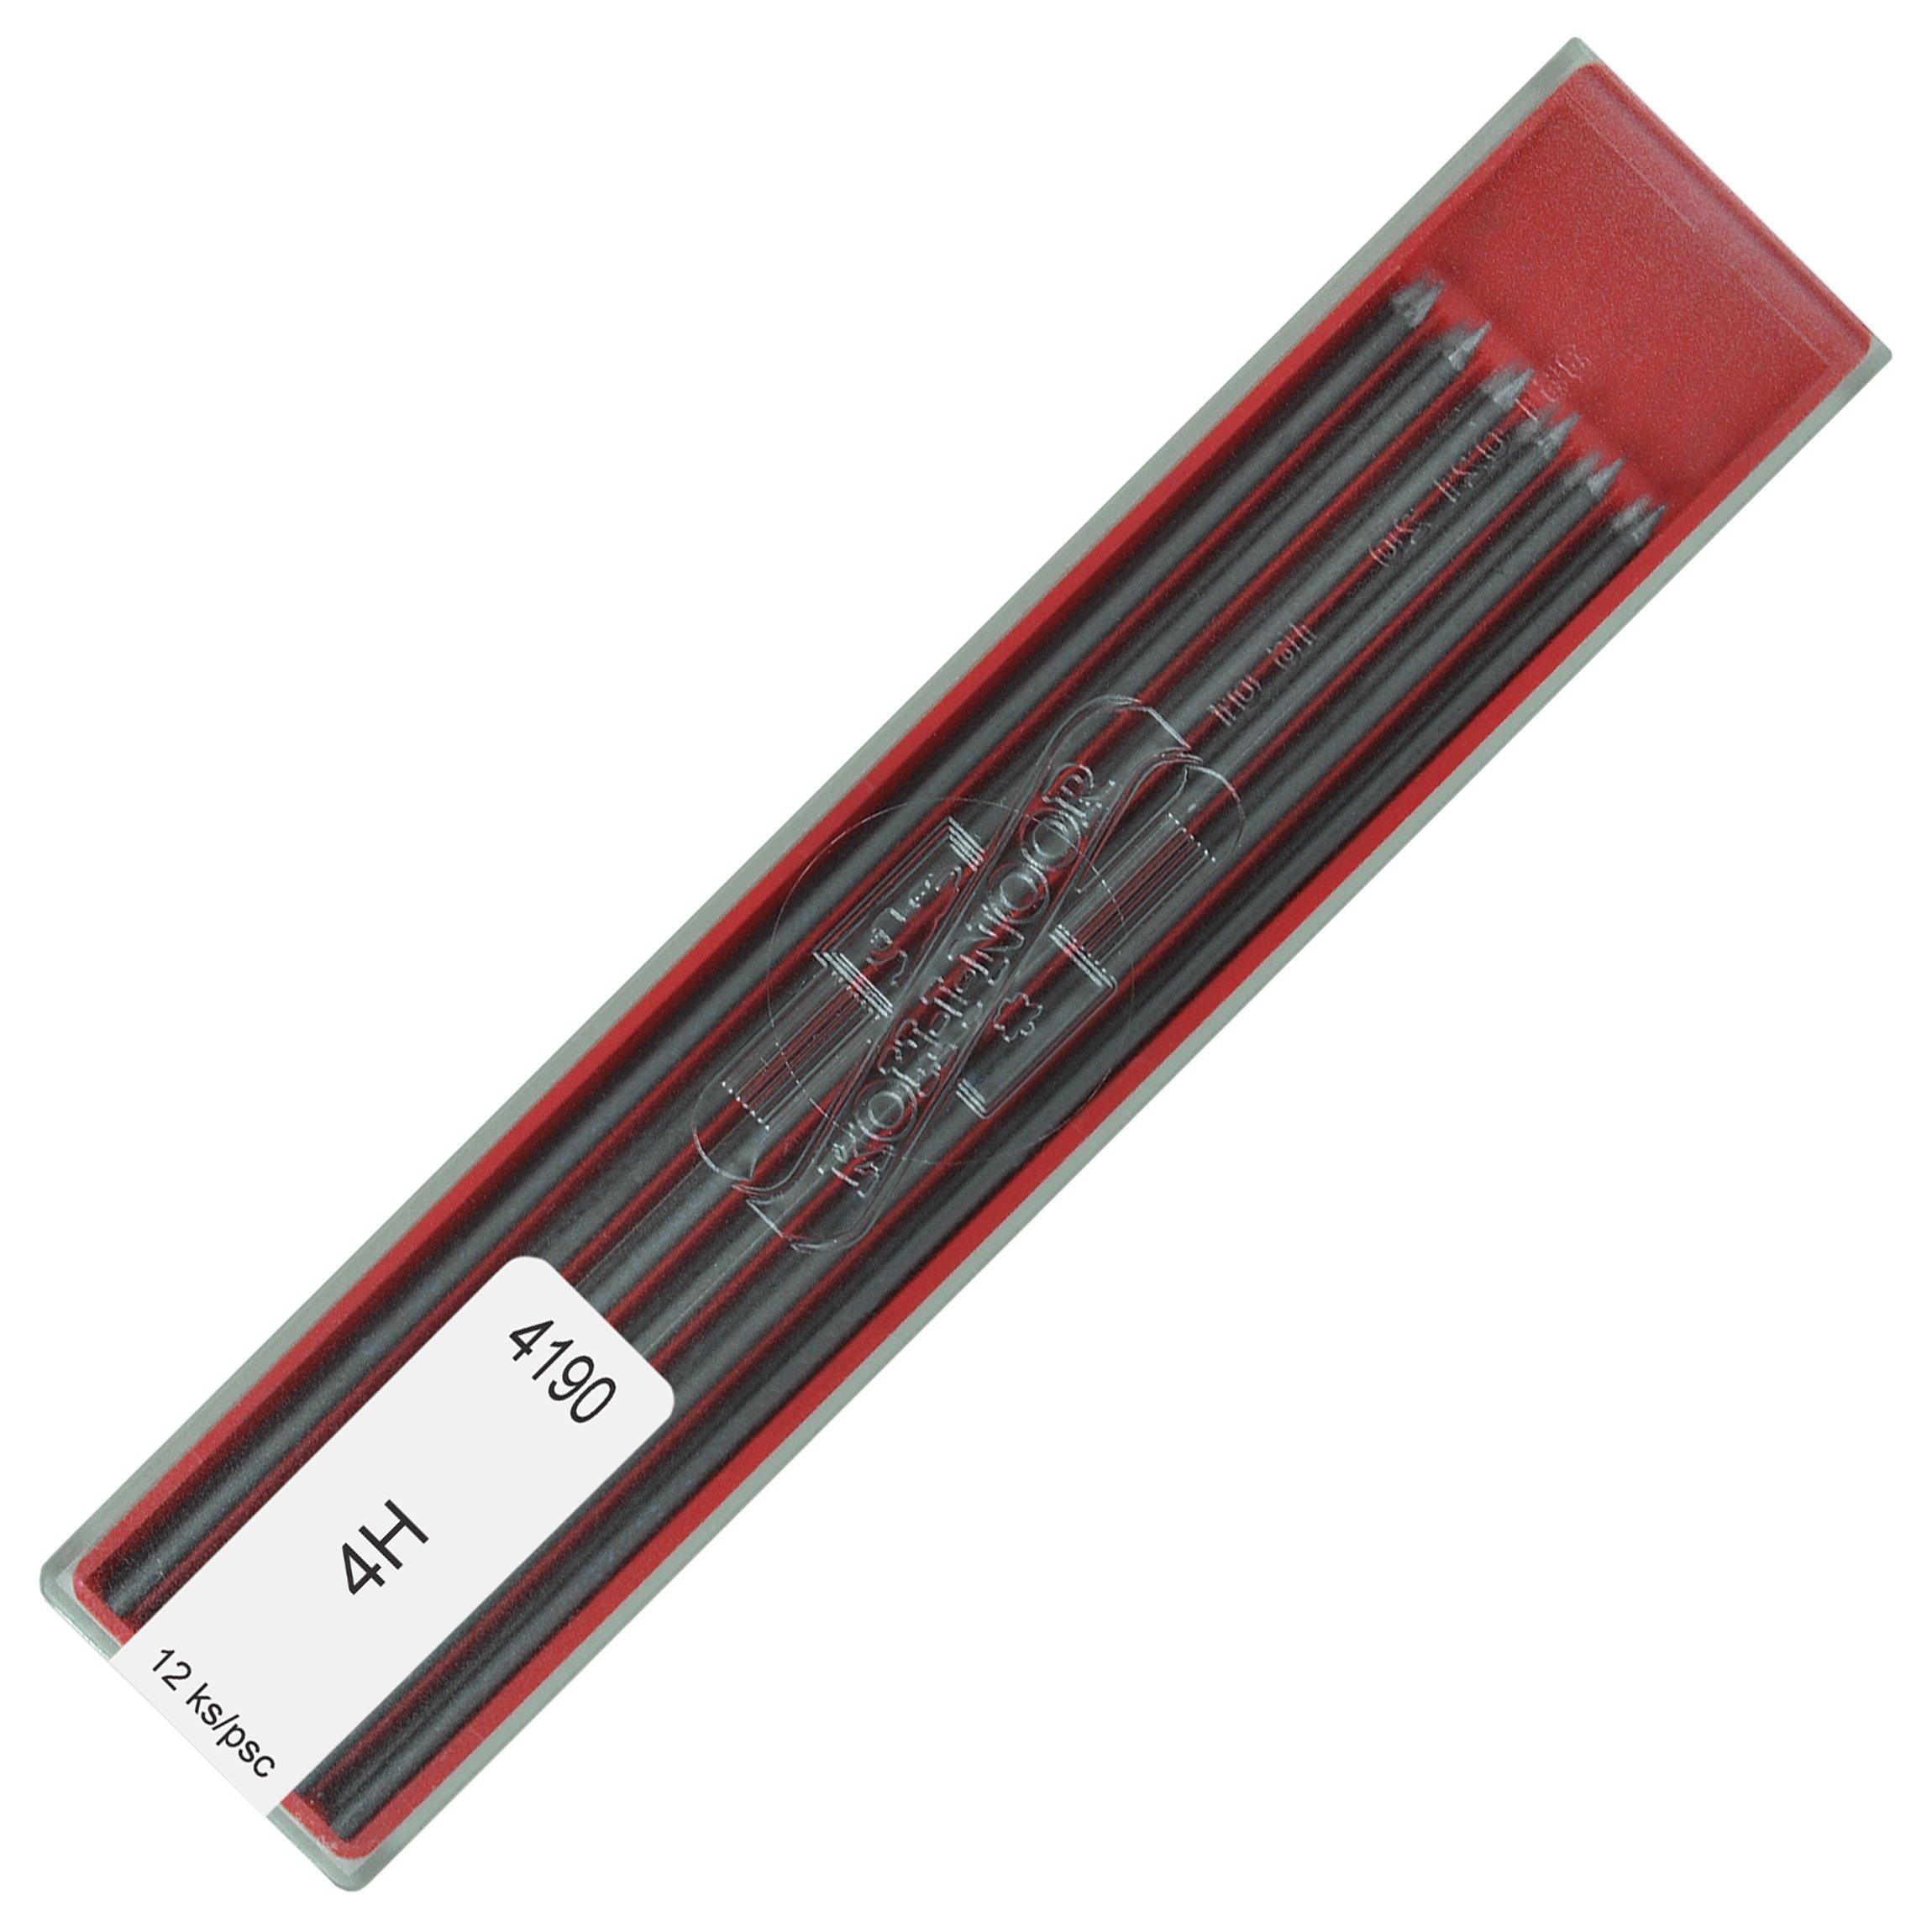 Koh-i-noor 6 Minas (1 Tubo) 2mm 4H